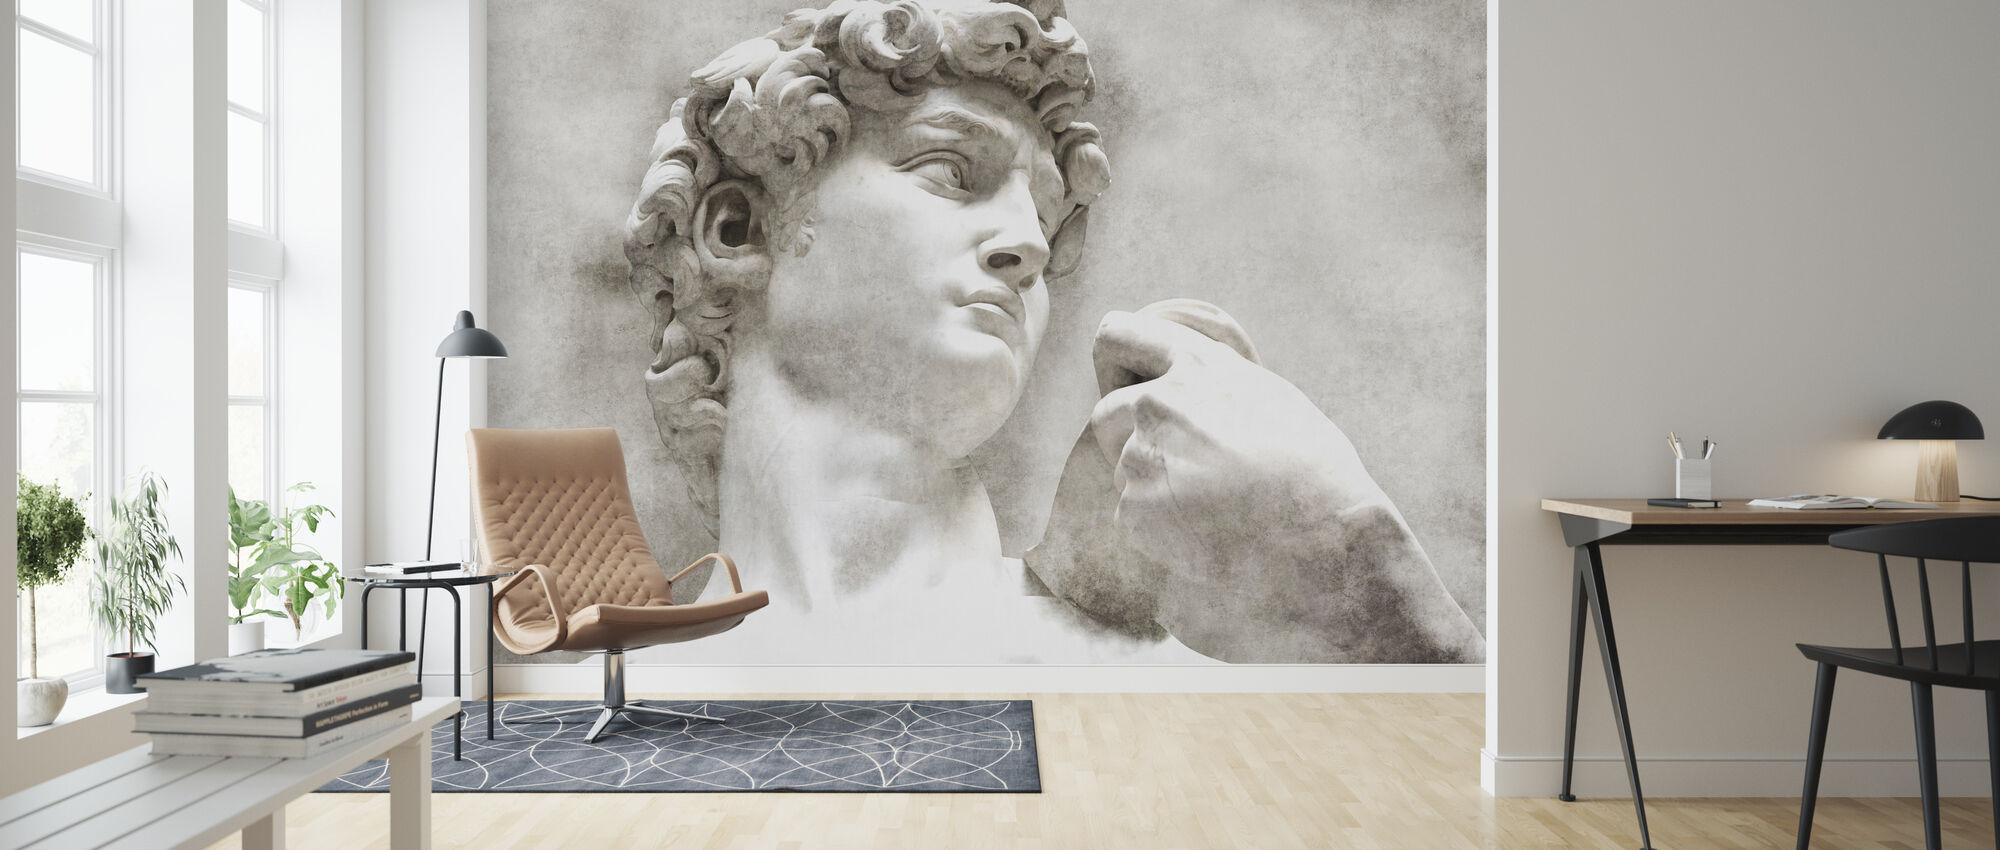 David Statue by Michelangelo - Wallpaper - Living Room